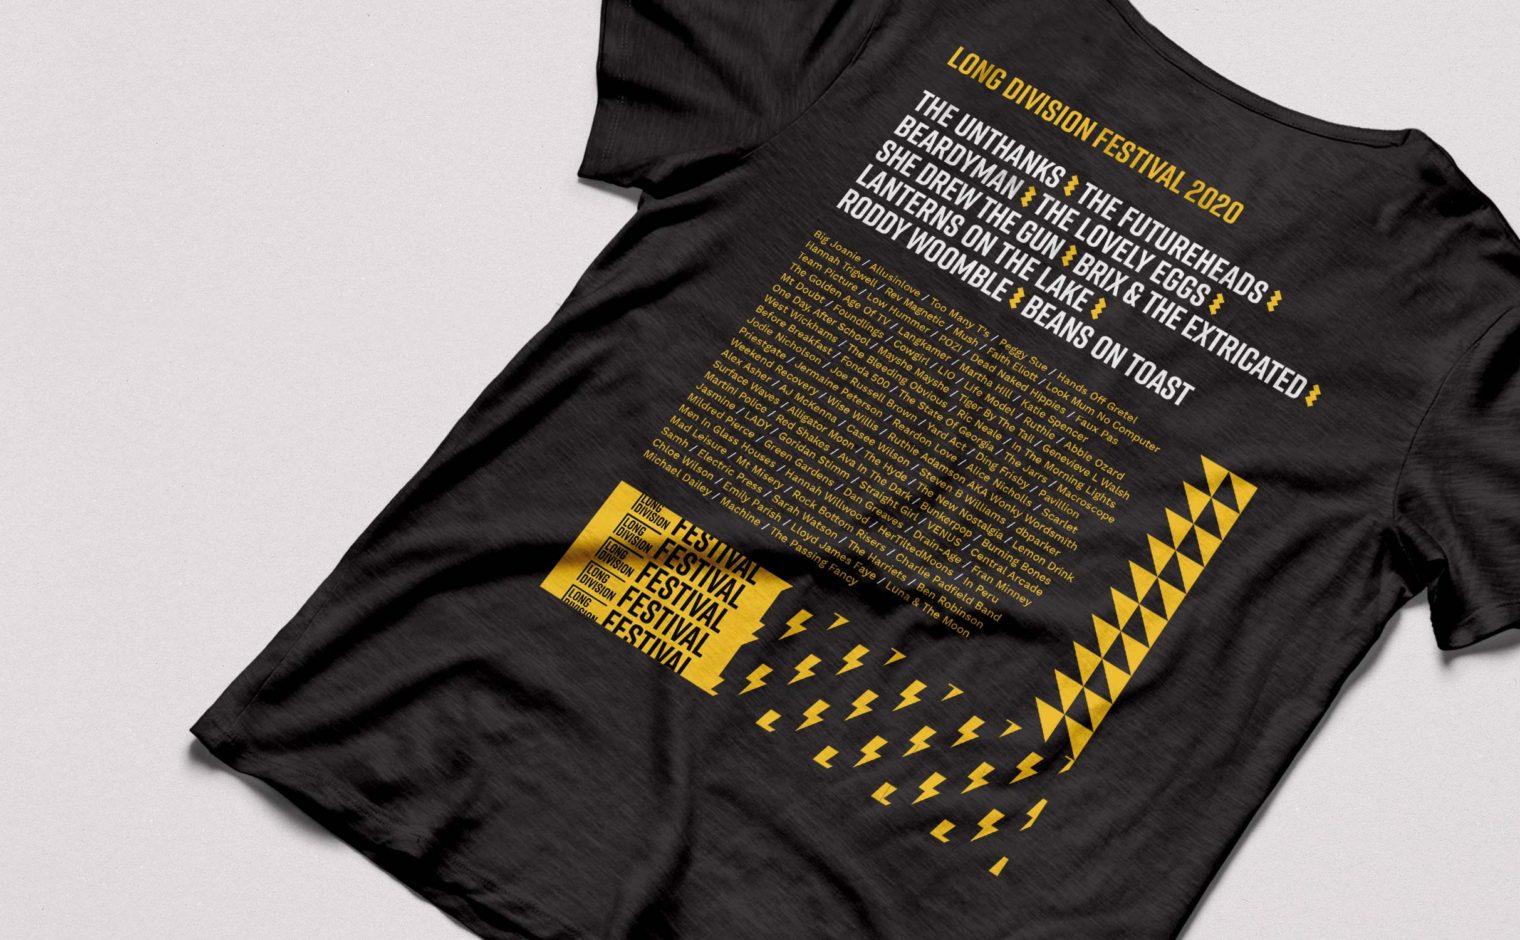 Long Division Festival t-shirt design